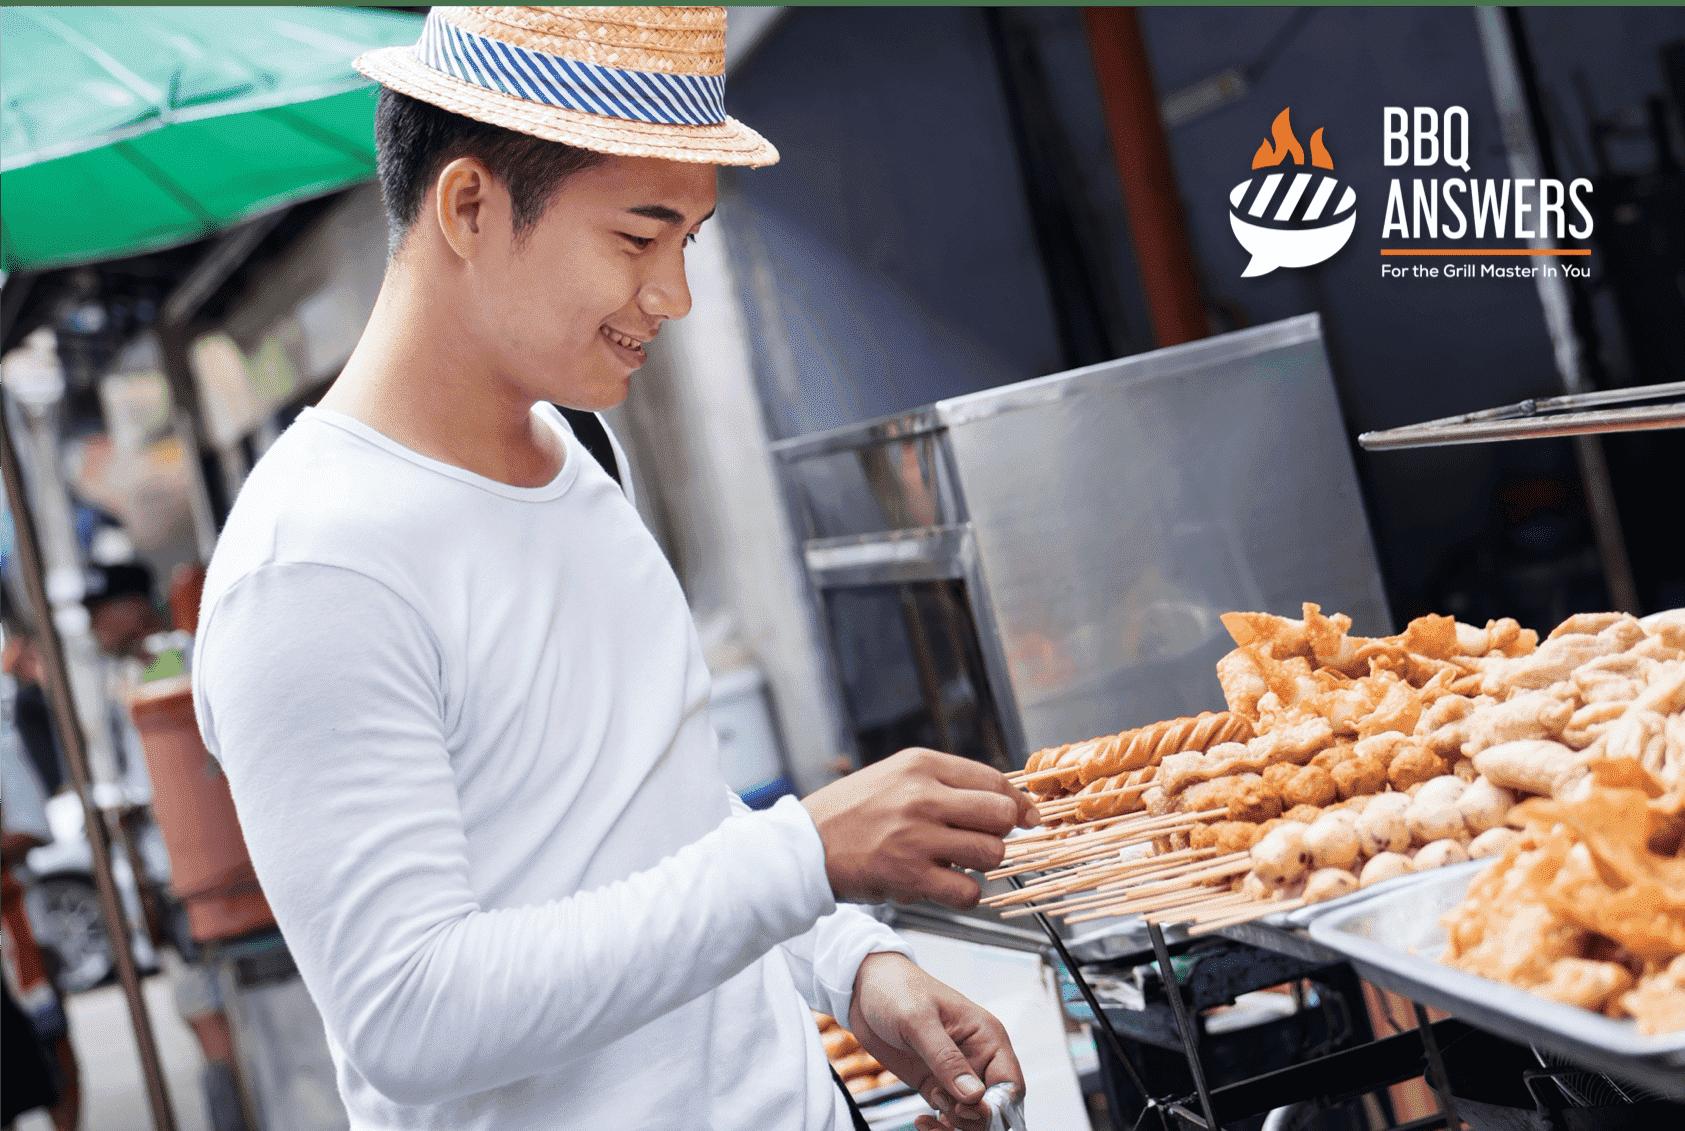 Chinese BBQ   BBQanswers